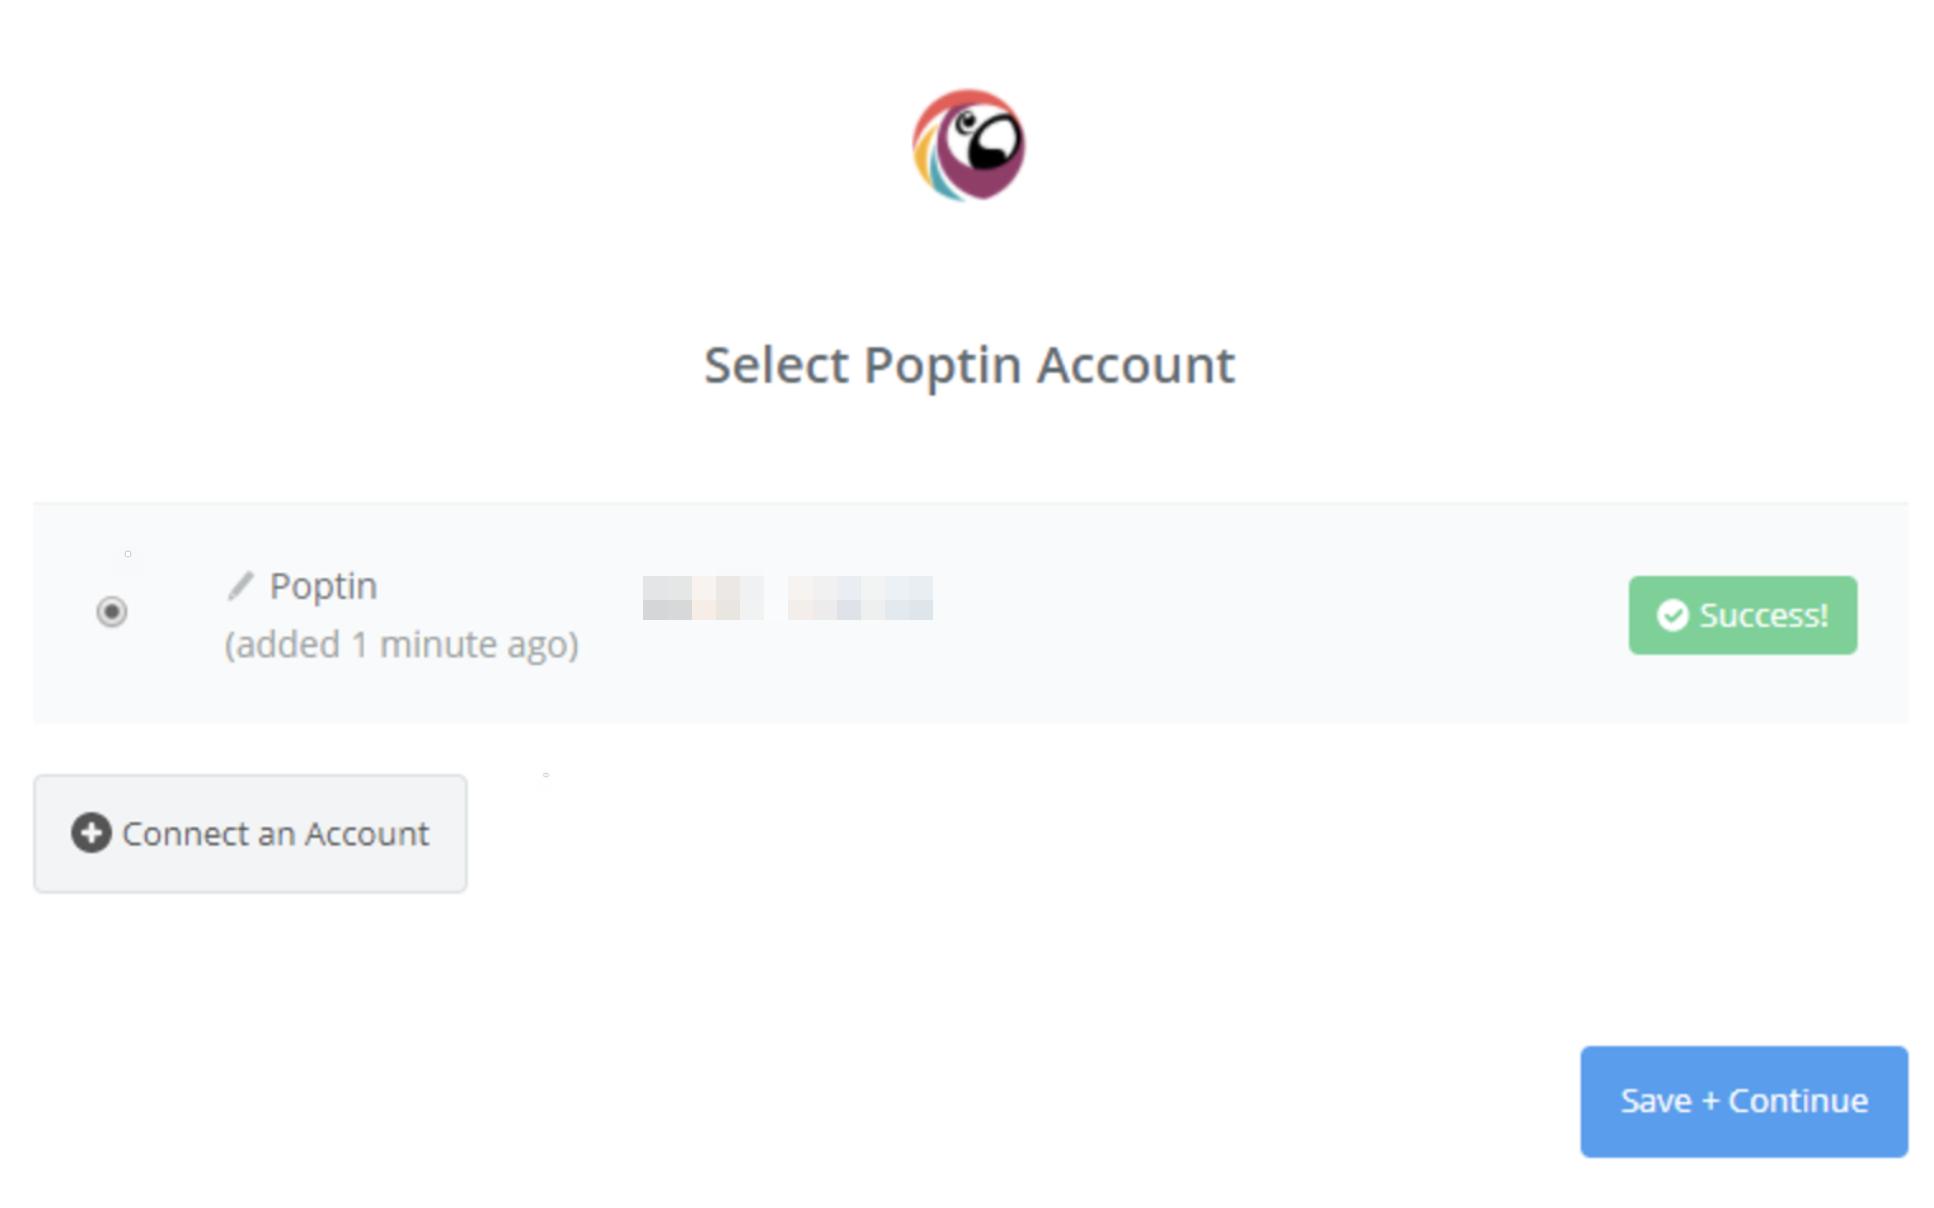 Poptin connection successfull